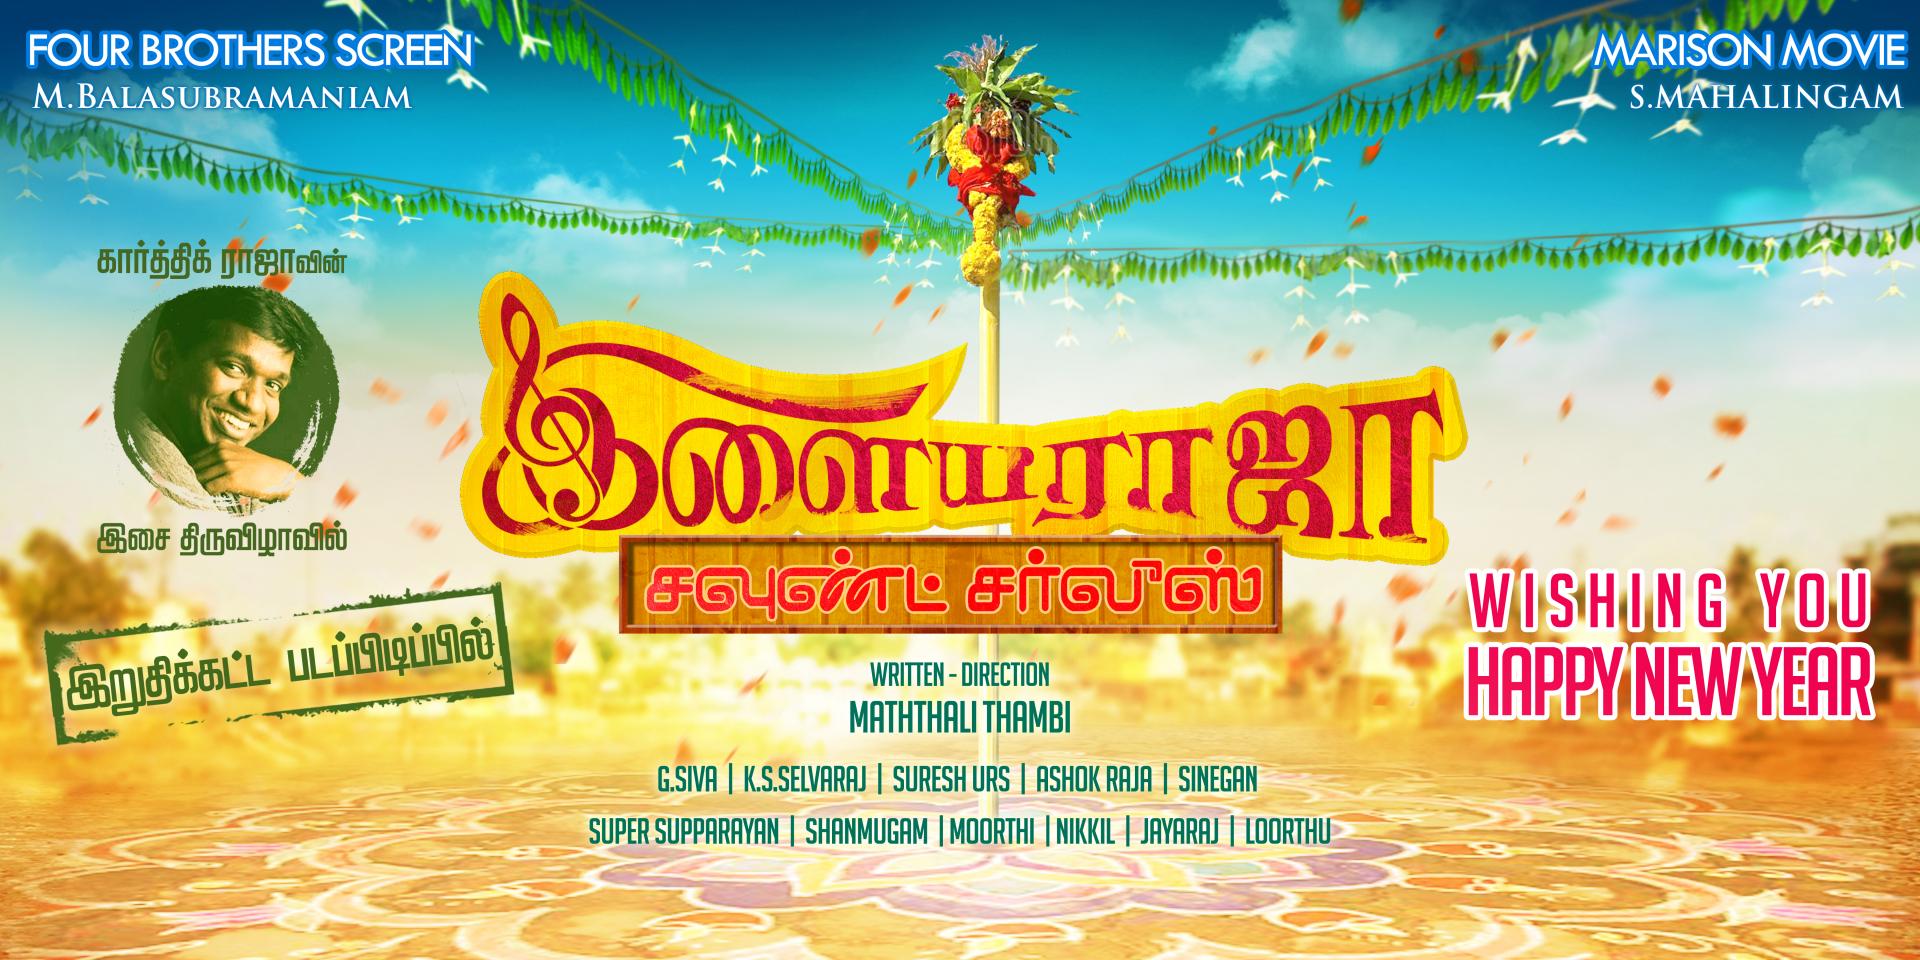 Ilayaraja Sound Service Movie First Look Poster Still